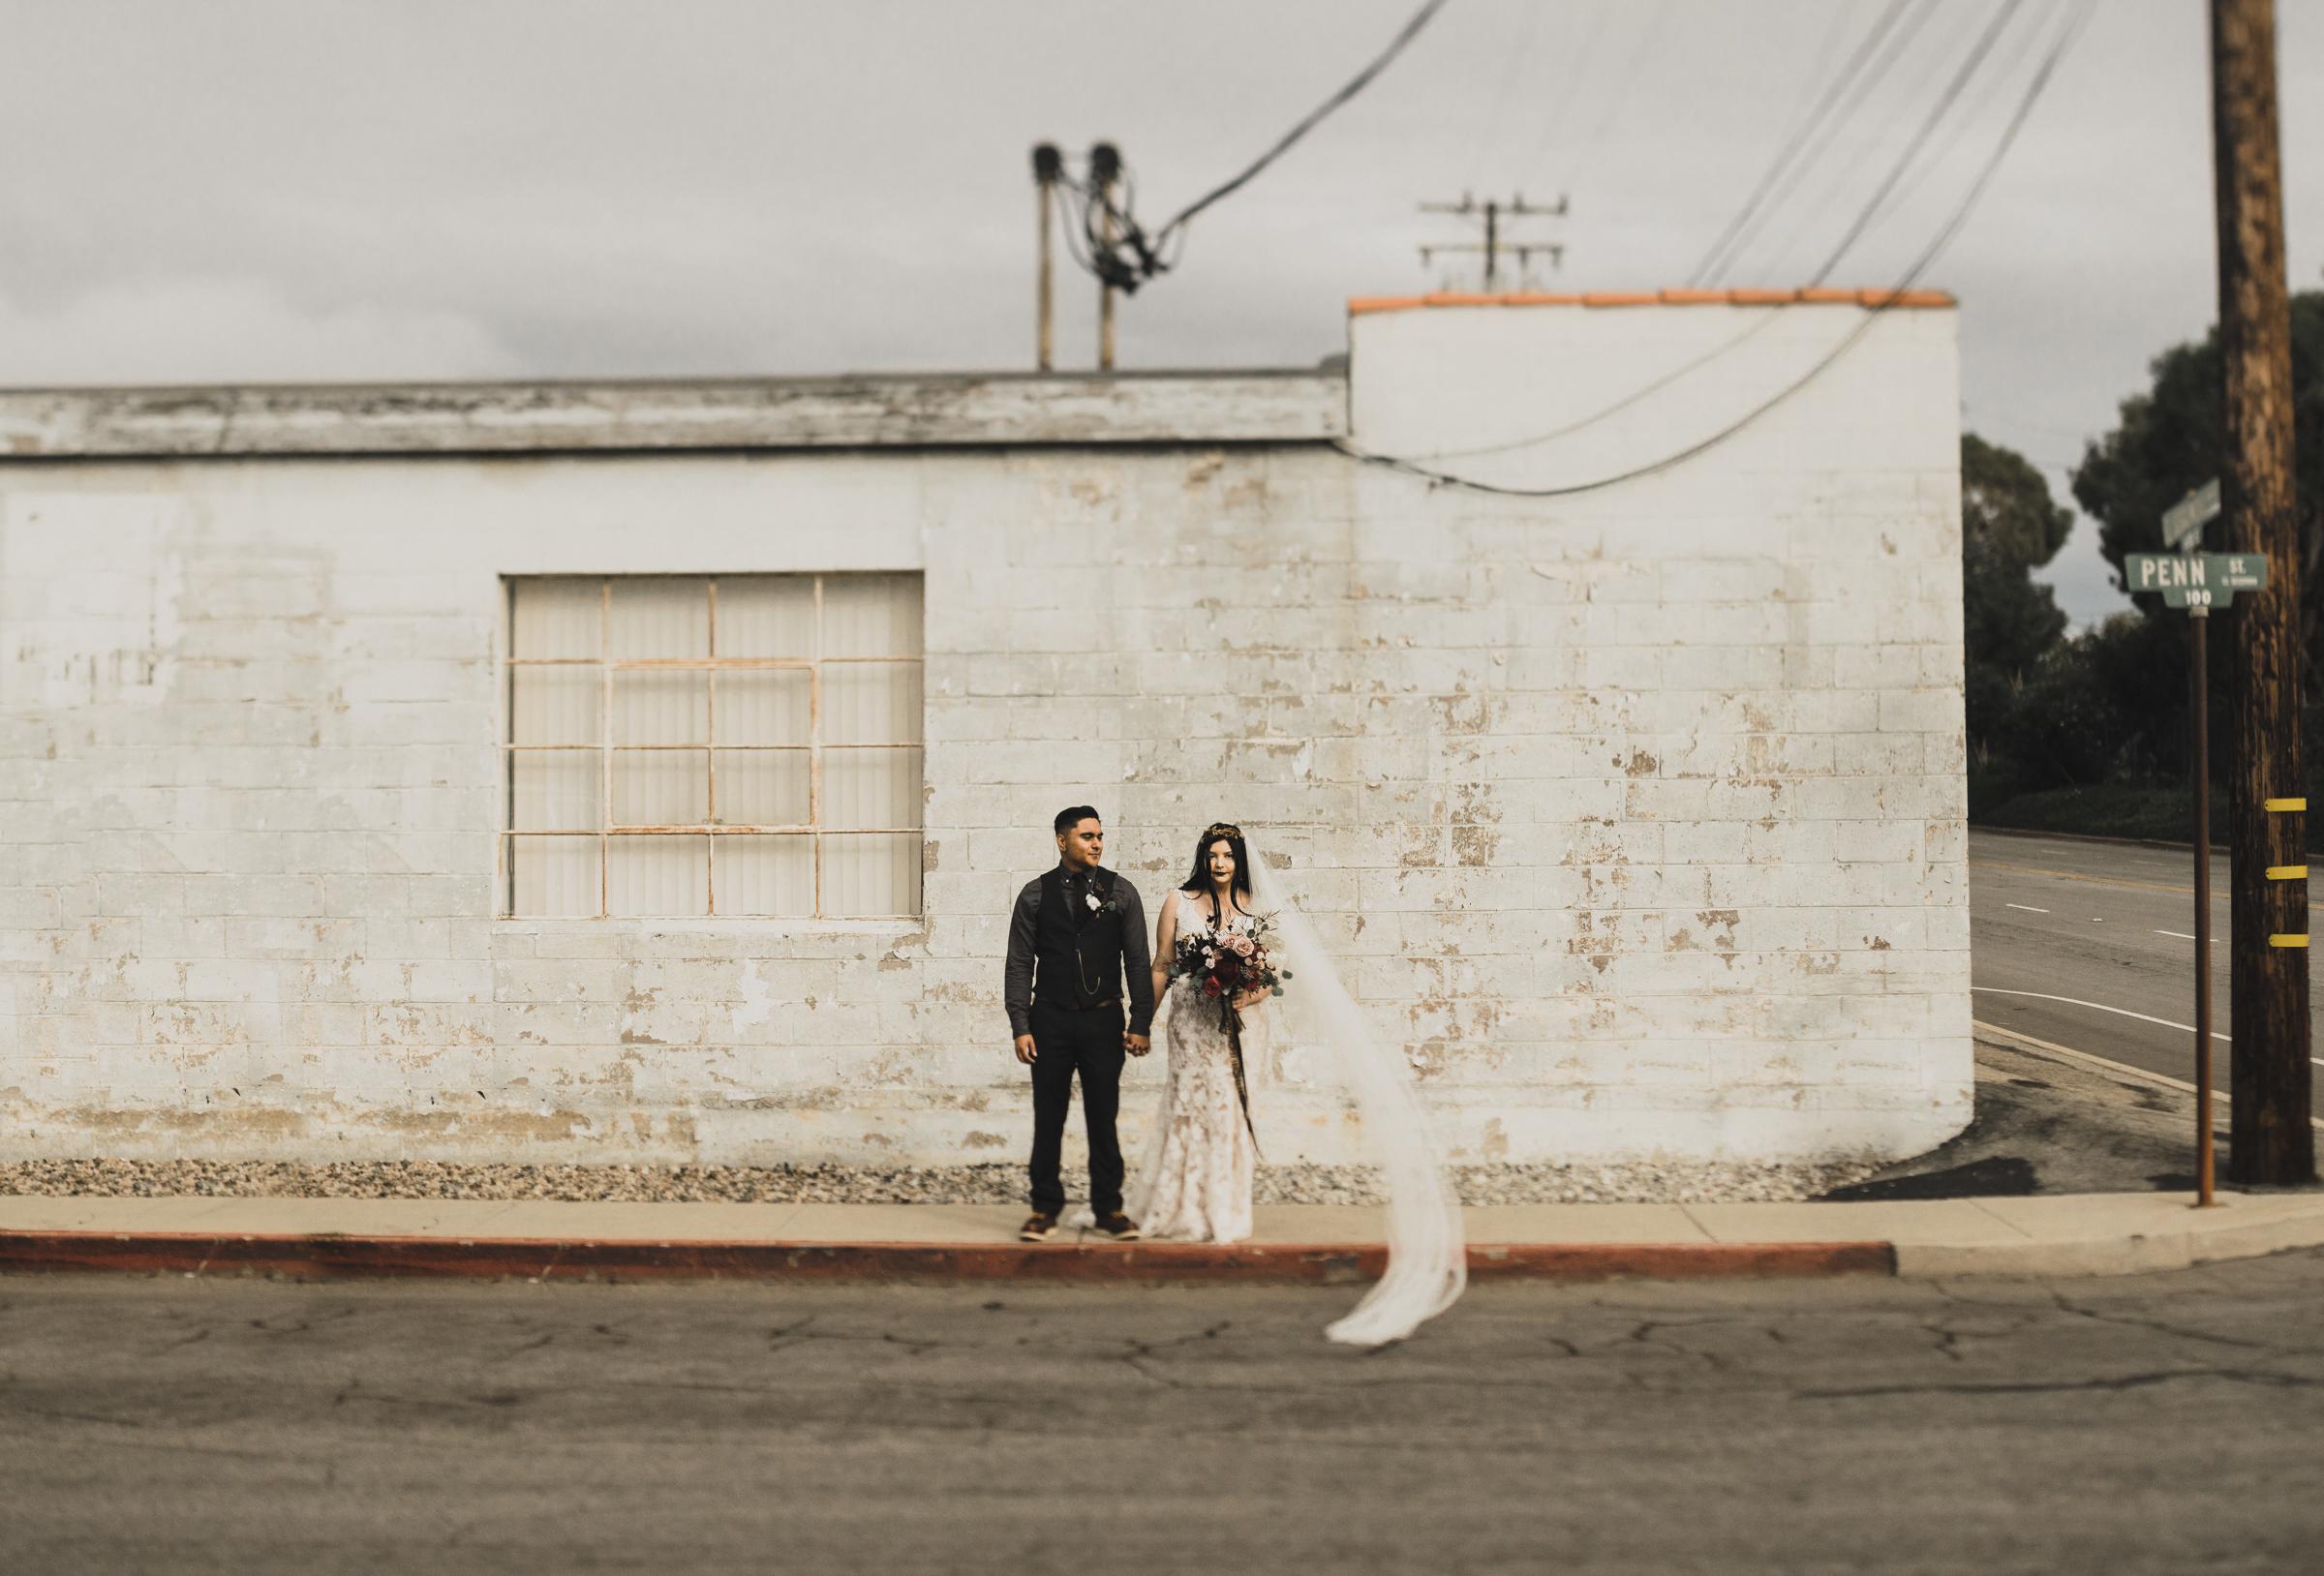 ©Isaiah + Taylor Photography - Smoky Hollow Studios Wedding, El Segundo, Los Angeles Wedding Photographer-77.jpg